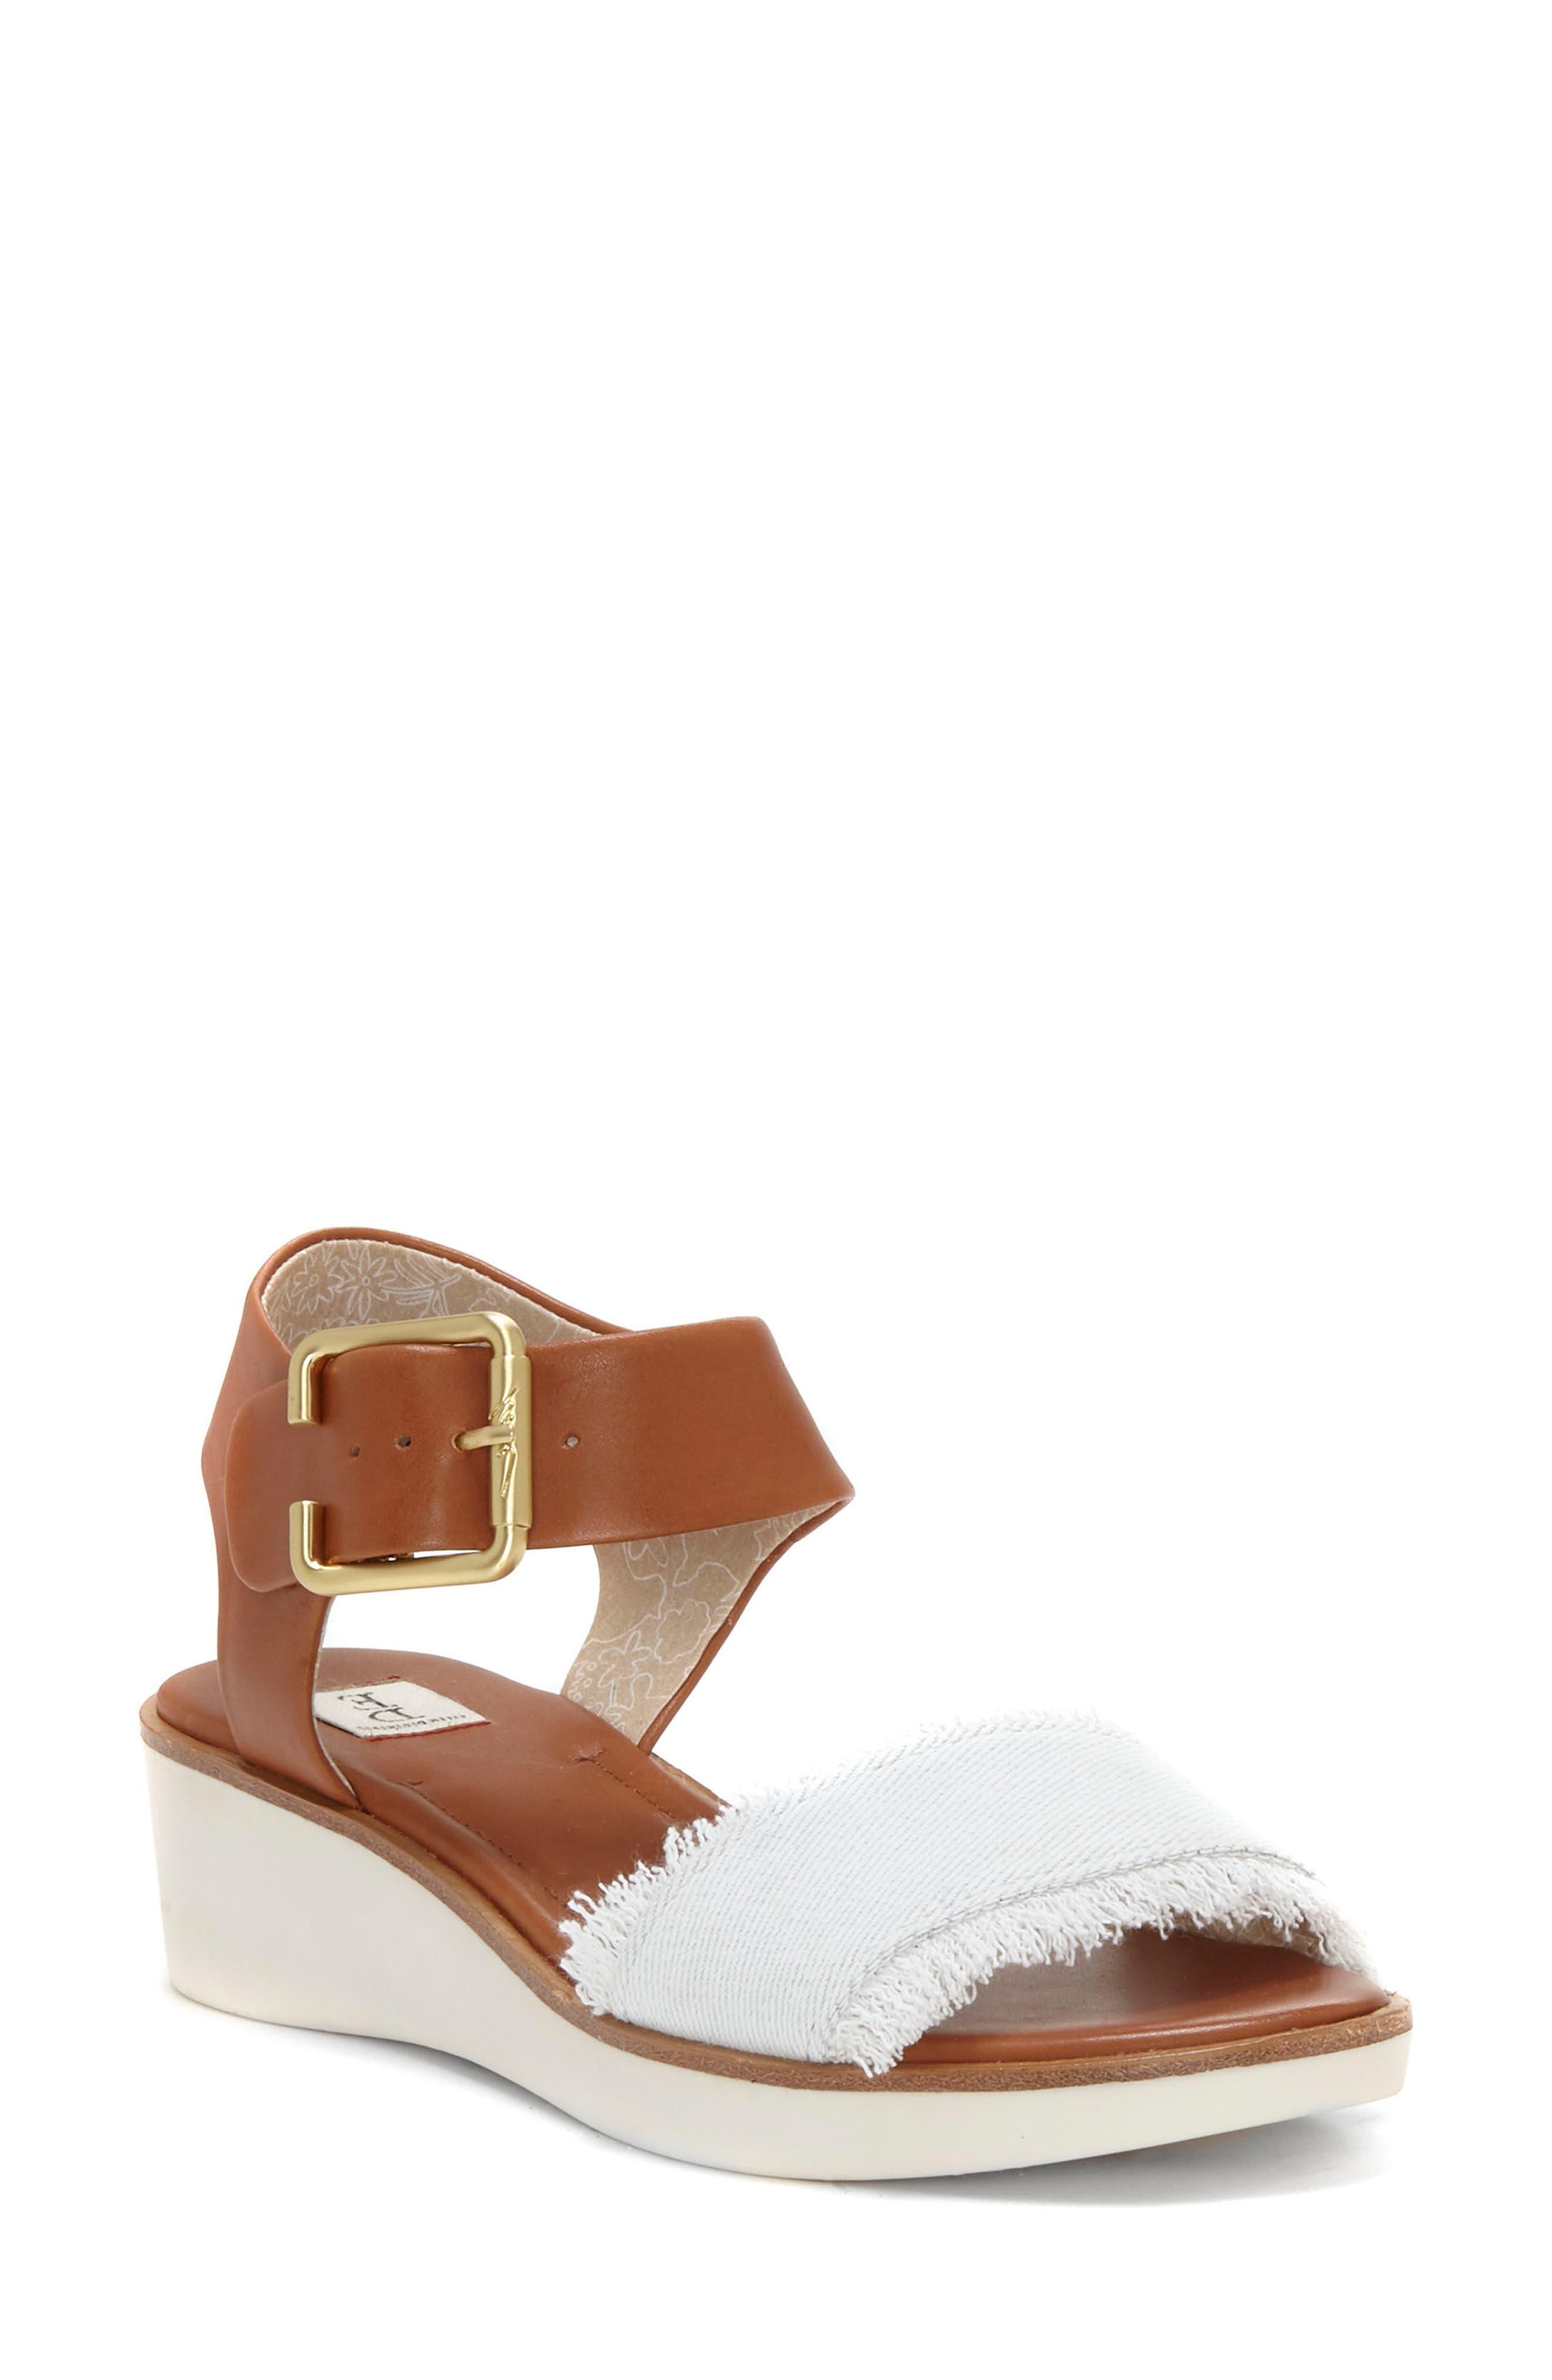 009fa02afff Ed Ellen Degeneres Satiana Sandal In Pure White Denim Fabric